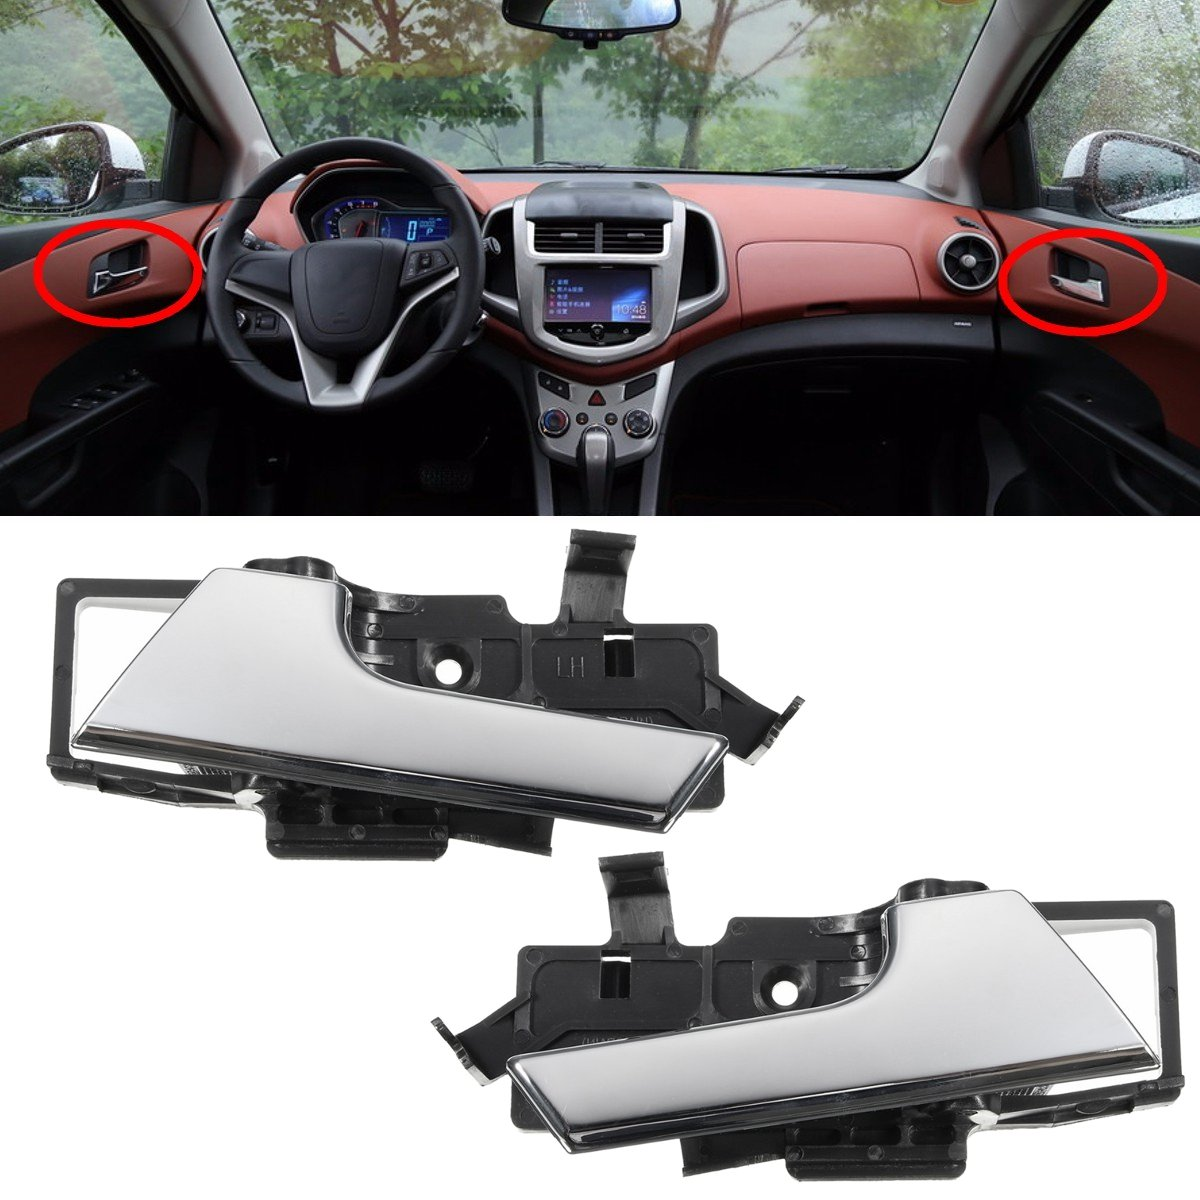 96462710 Car Interior Door Handle Right Left For Chevrolet Aveo 2007 2008 2009 2010 2011 Aveo5 For Pontiac G3 Car Styling Interior Door Handles Aliexpress